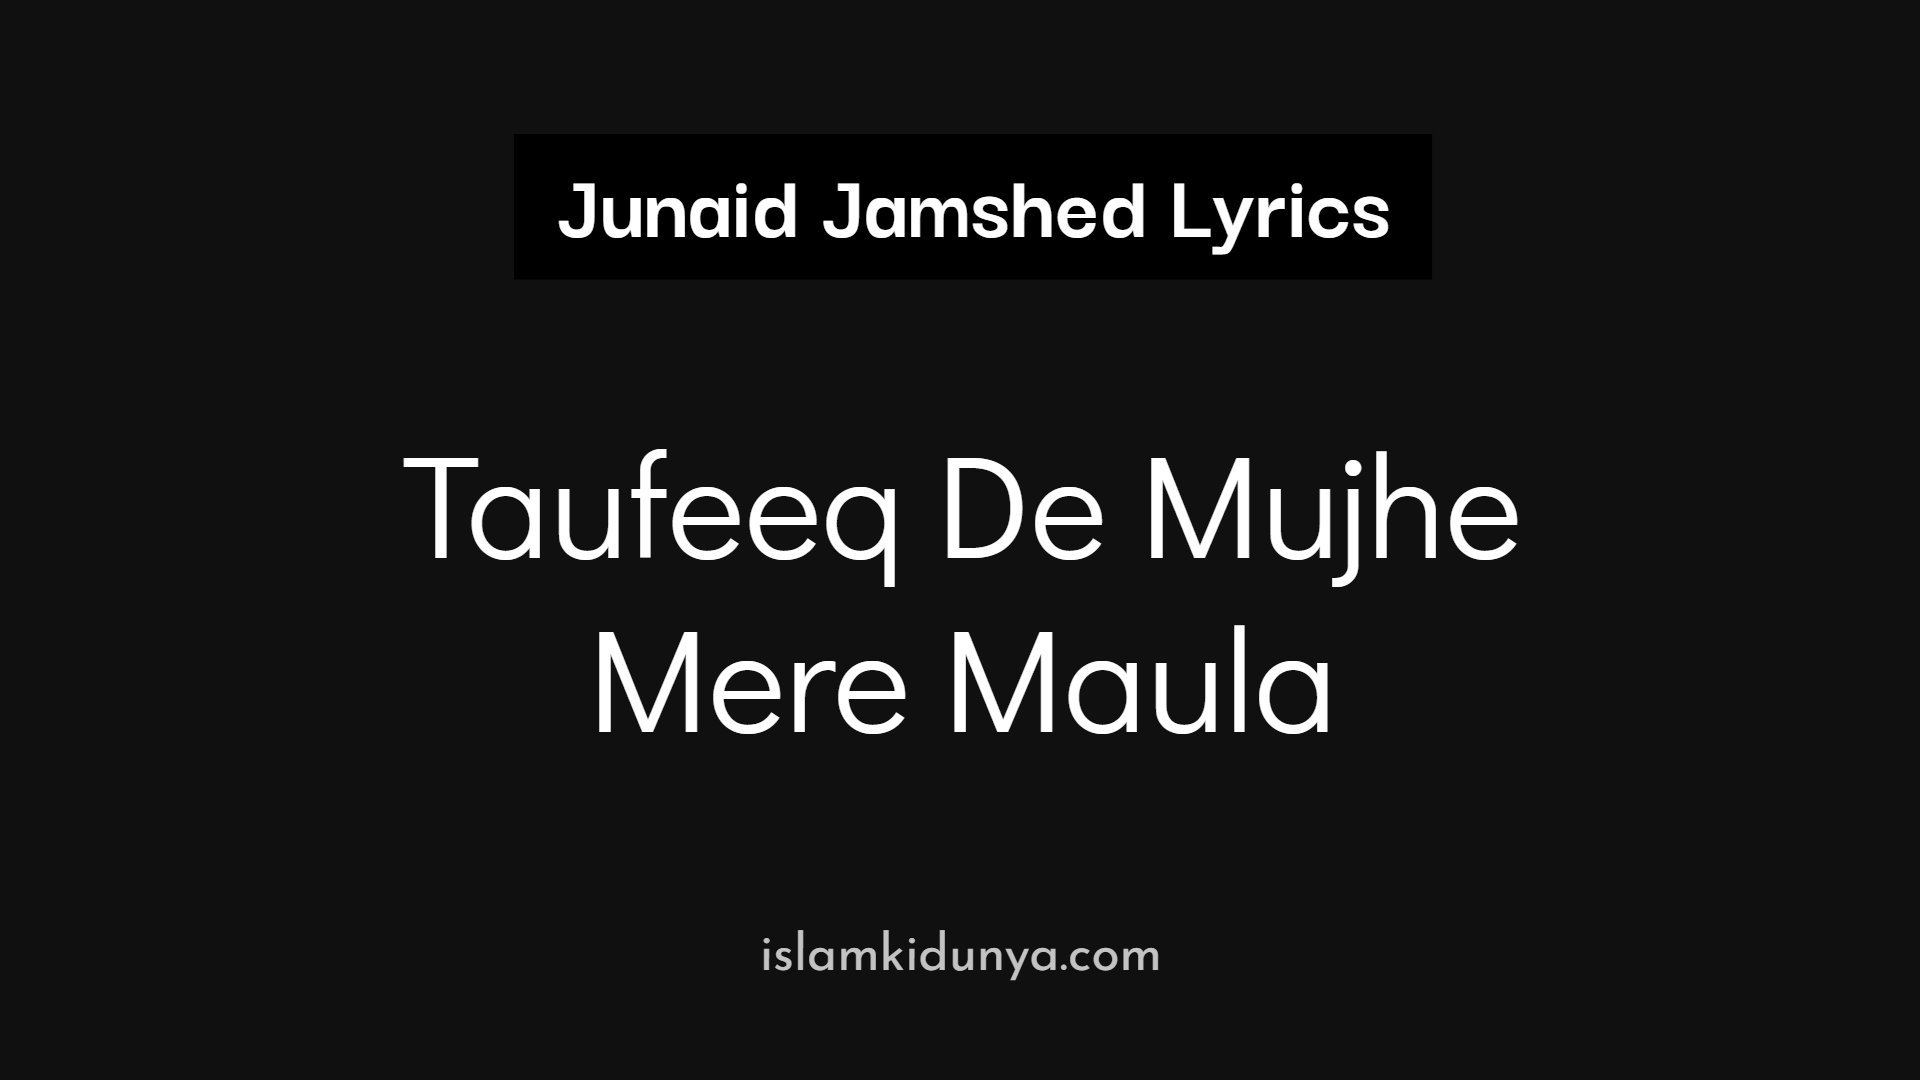 Taufeeq De Mujhe Mere Maula - Junaid Jamshed (Lyrics)